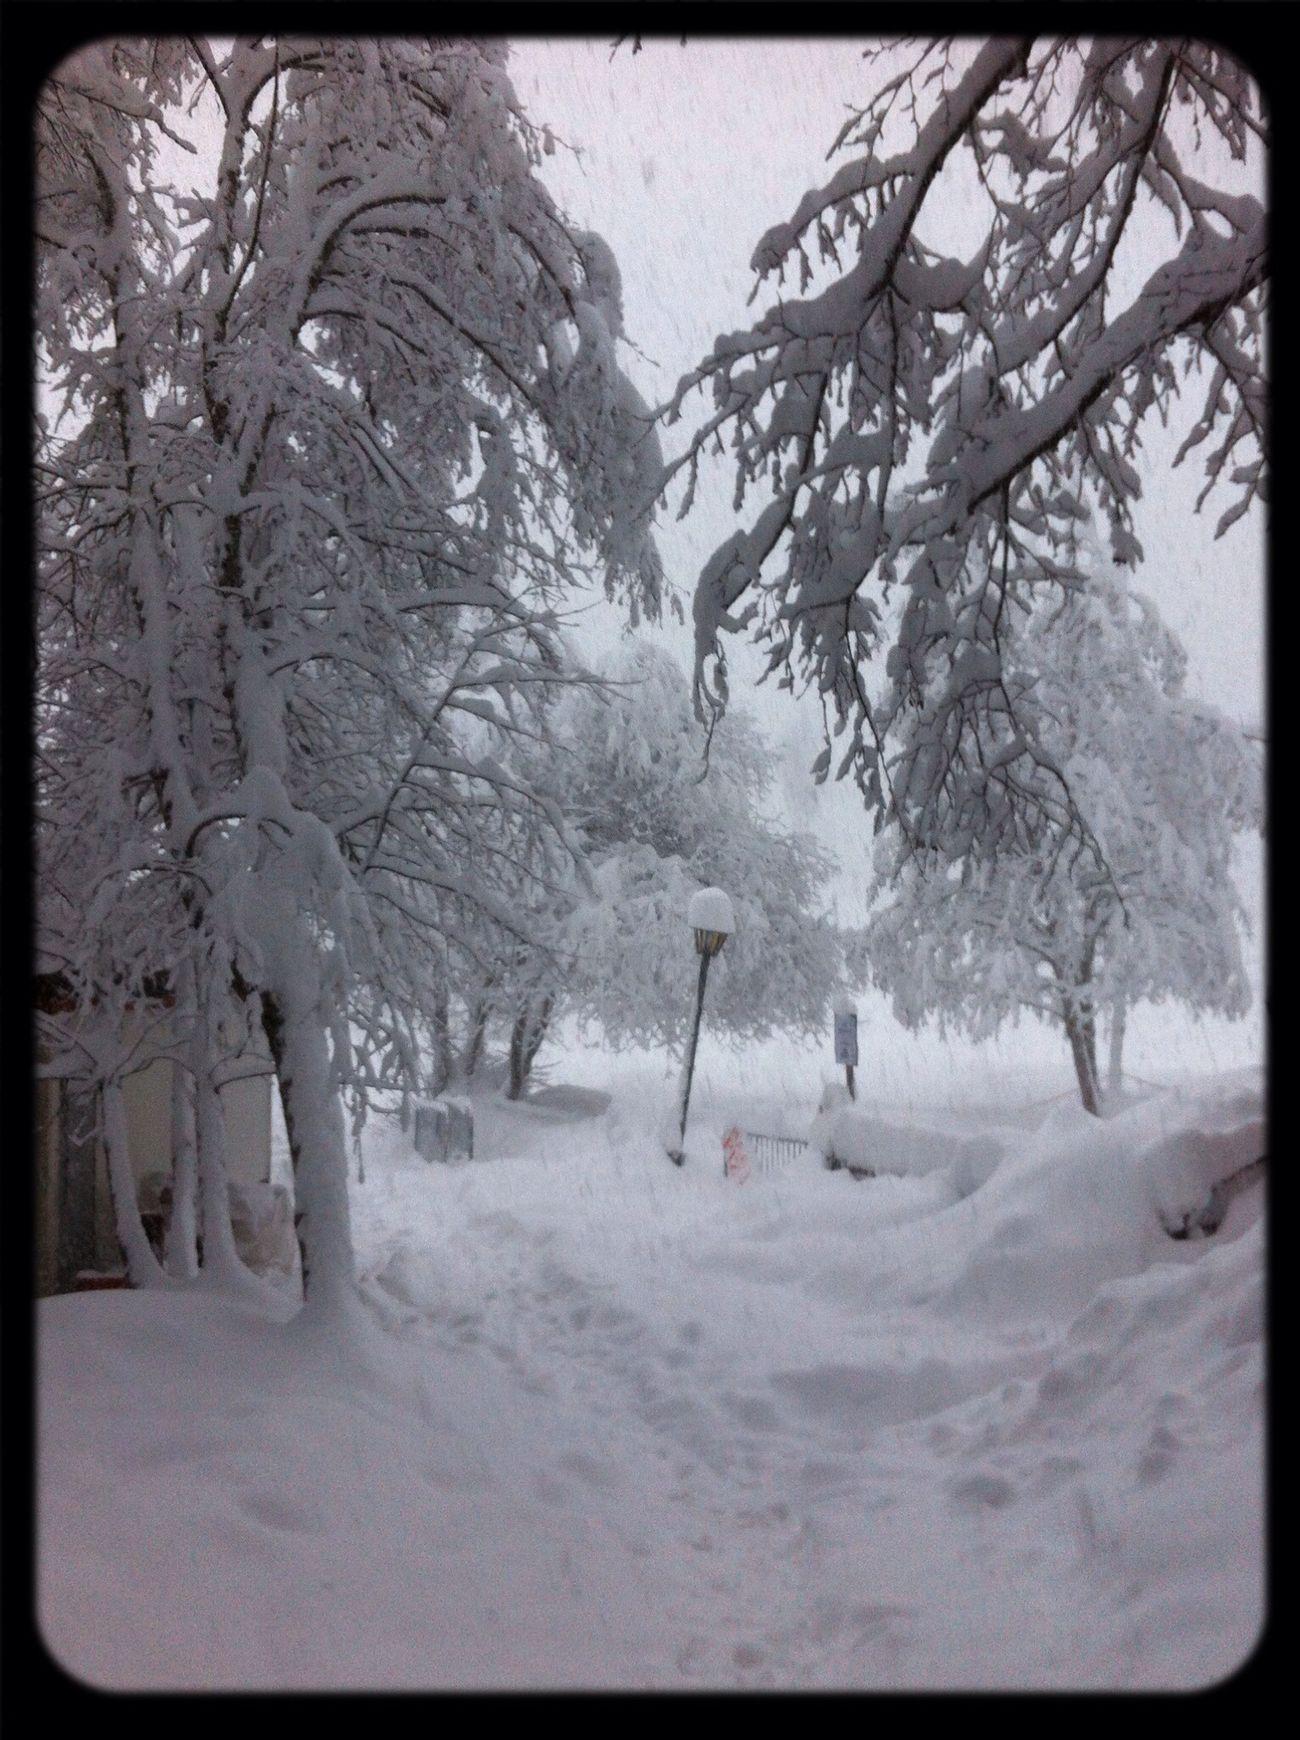 Ayas sotto la neve. Snow